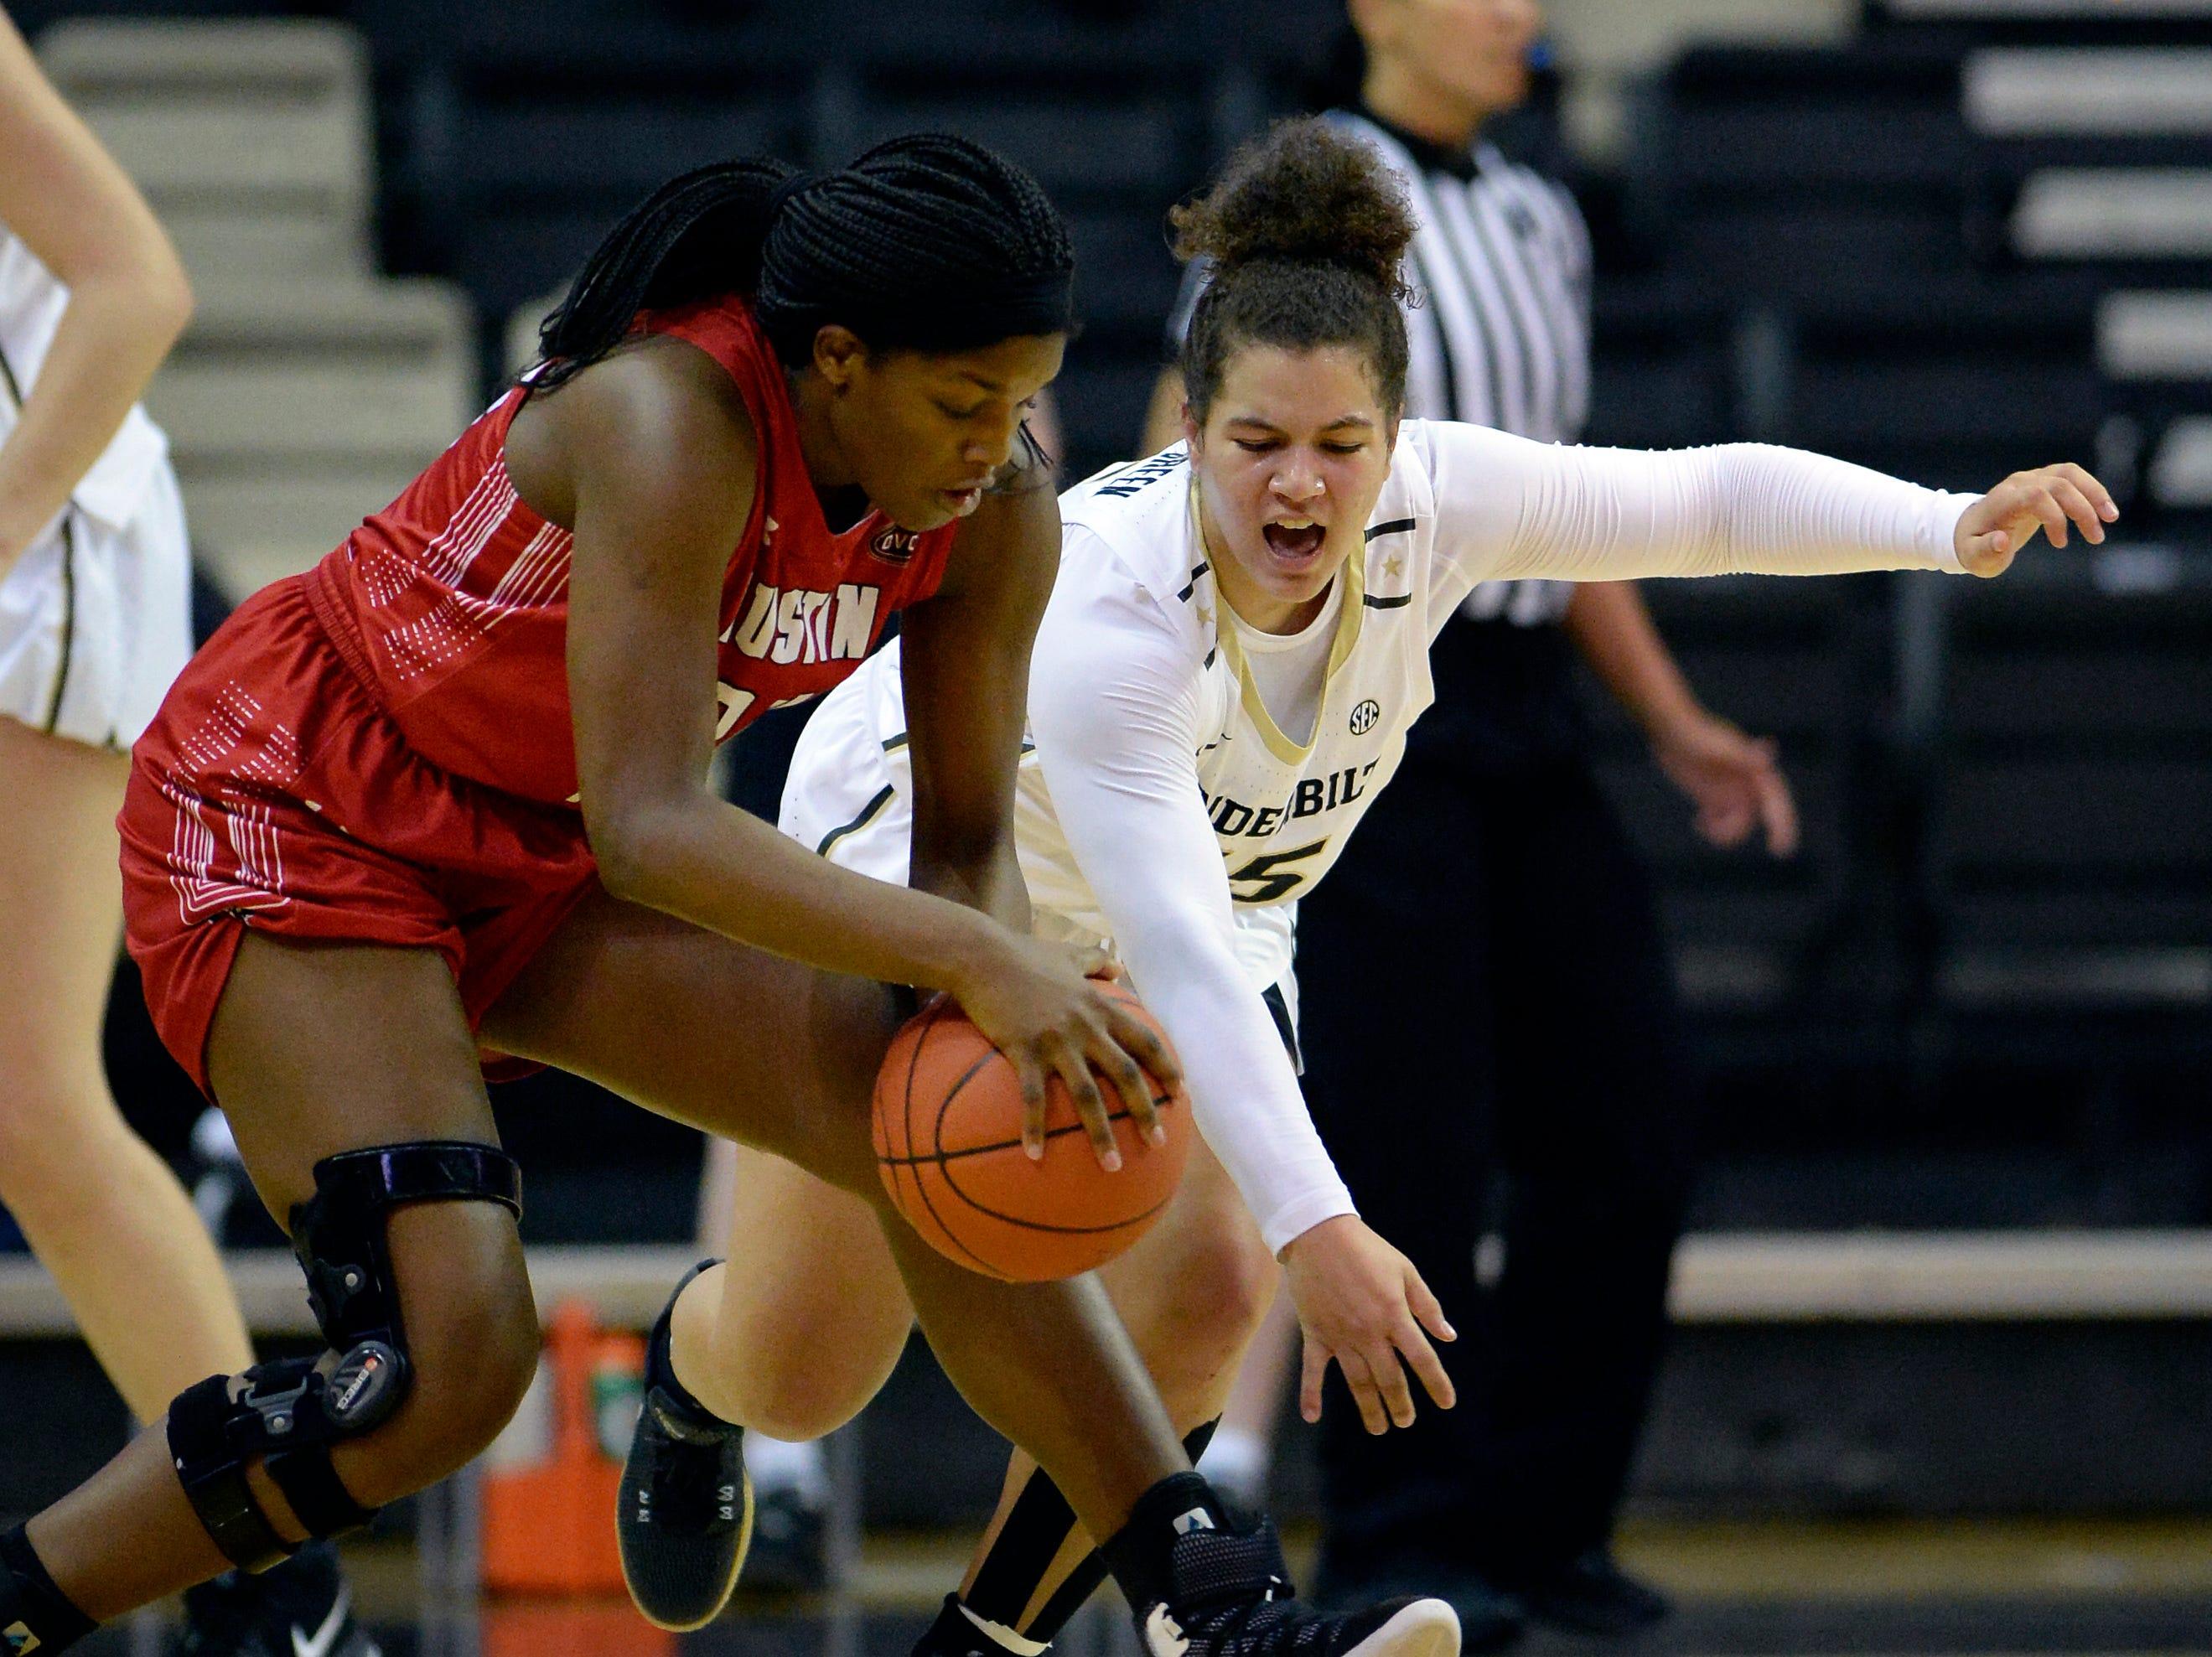 Austin Peay forward Kelen Kenol (24) is defended by Vanderbilt guard Kaleigh Clemons-Green (35) during the first half of an NCAA college basketball game Monday, Nov. 12, 2018, in Nashville, Tenn.